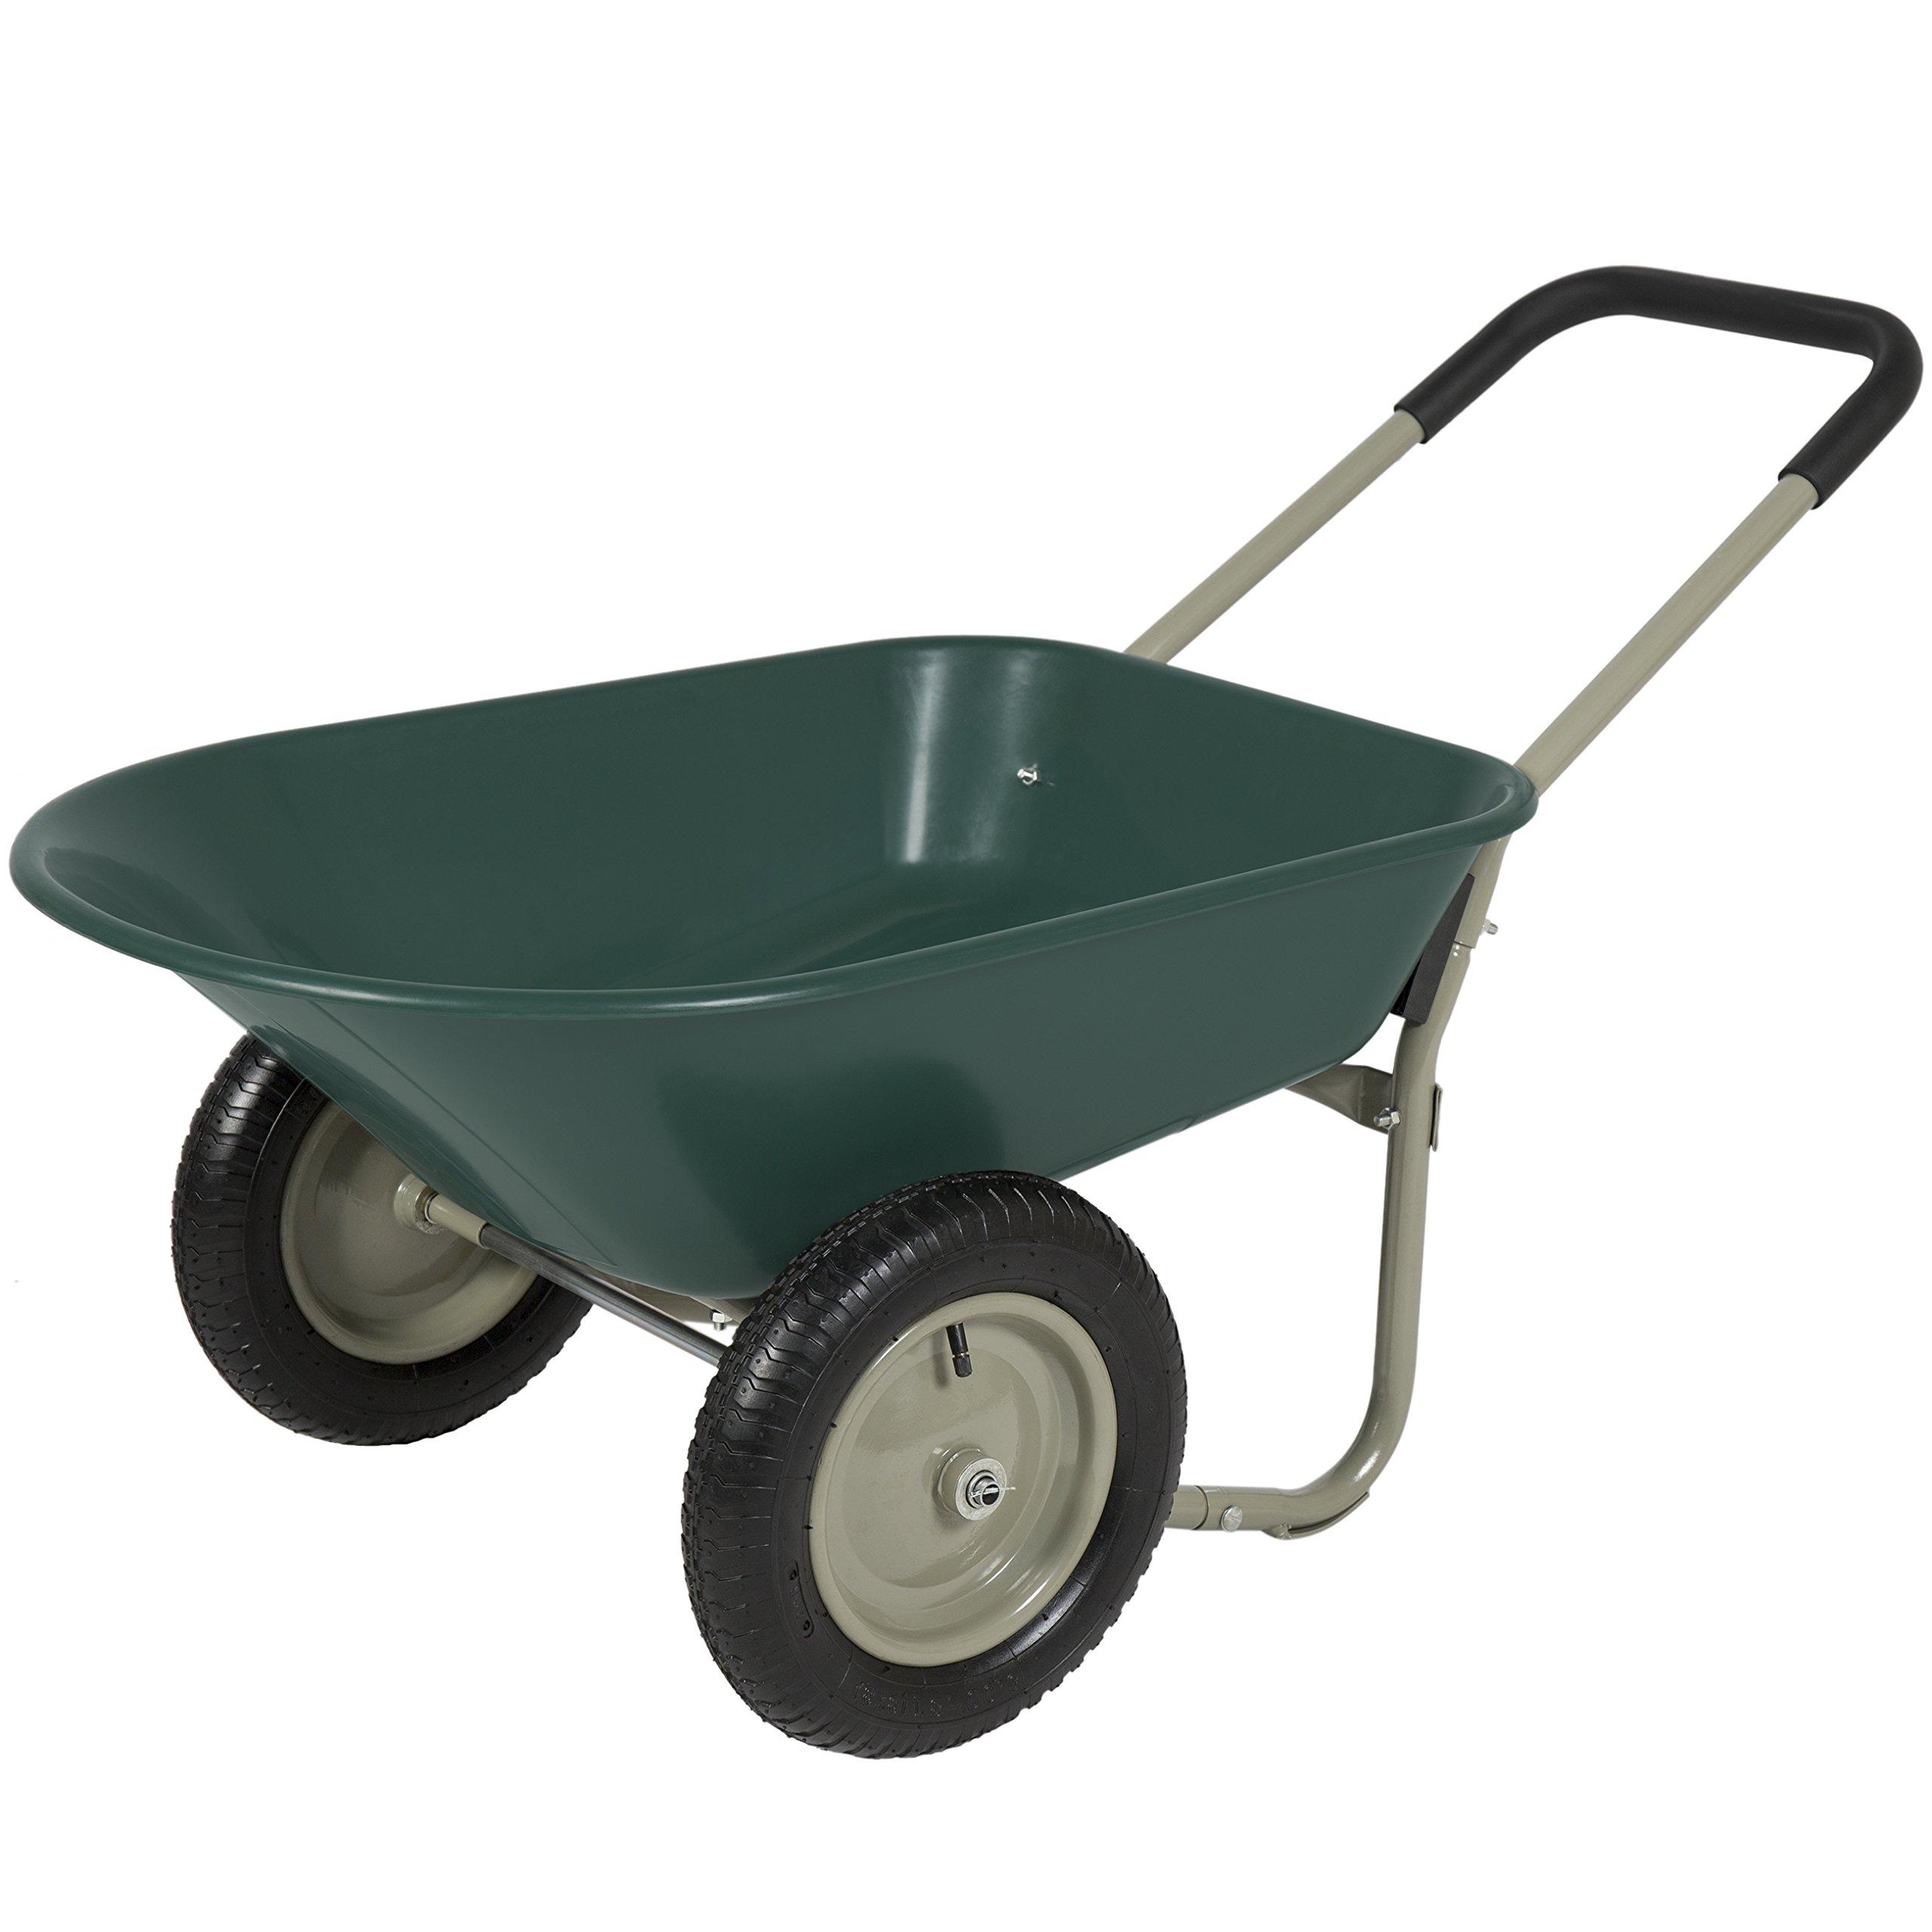 Best Choice Products Wheelbarrow Garden